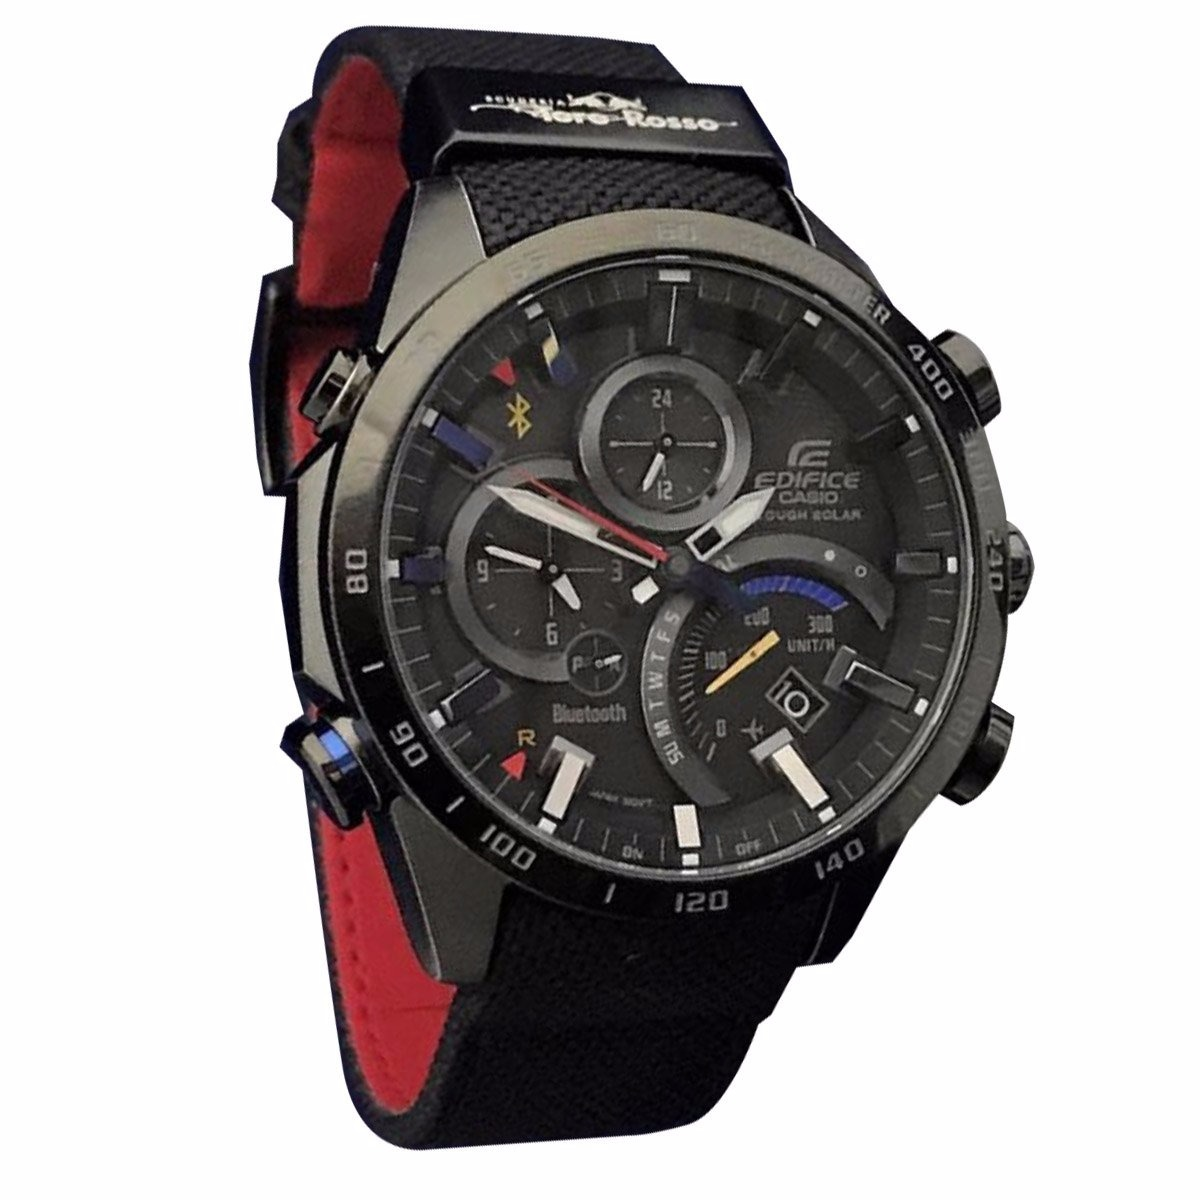 6c916cfd1c19 Reloj Casio Edifice Eqb-501trc-1a Hombre Envio Gratis -   48.004